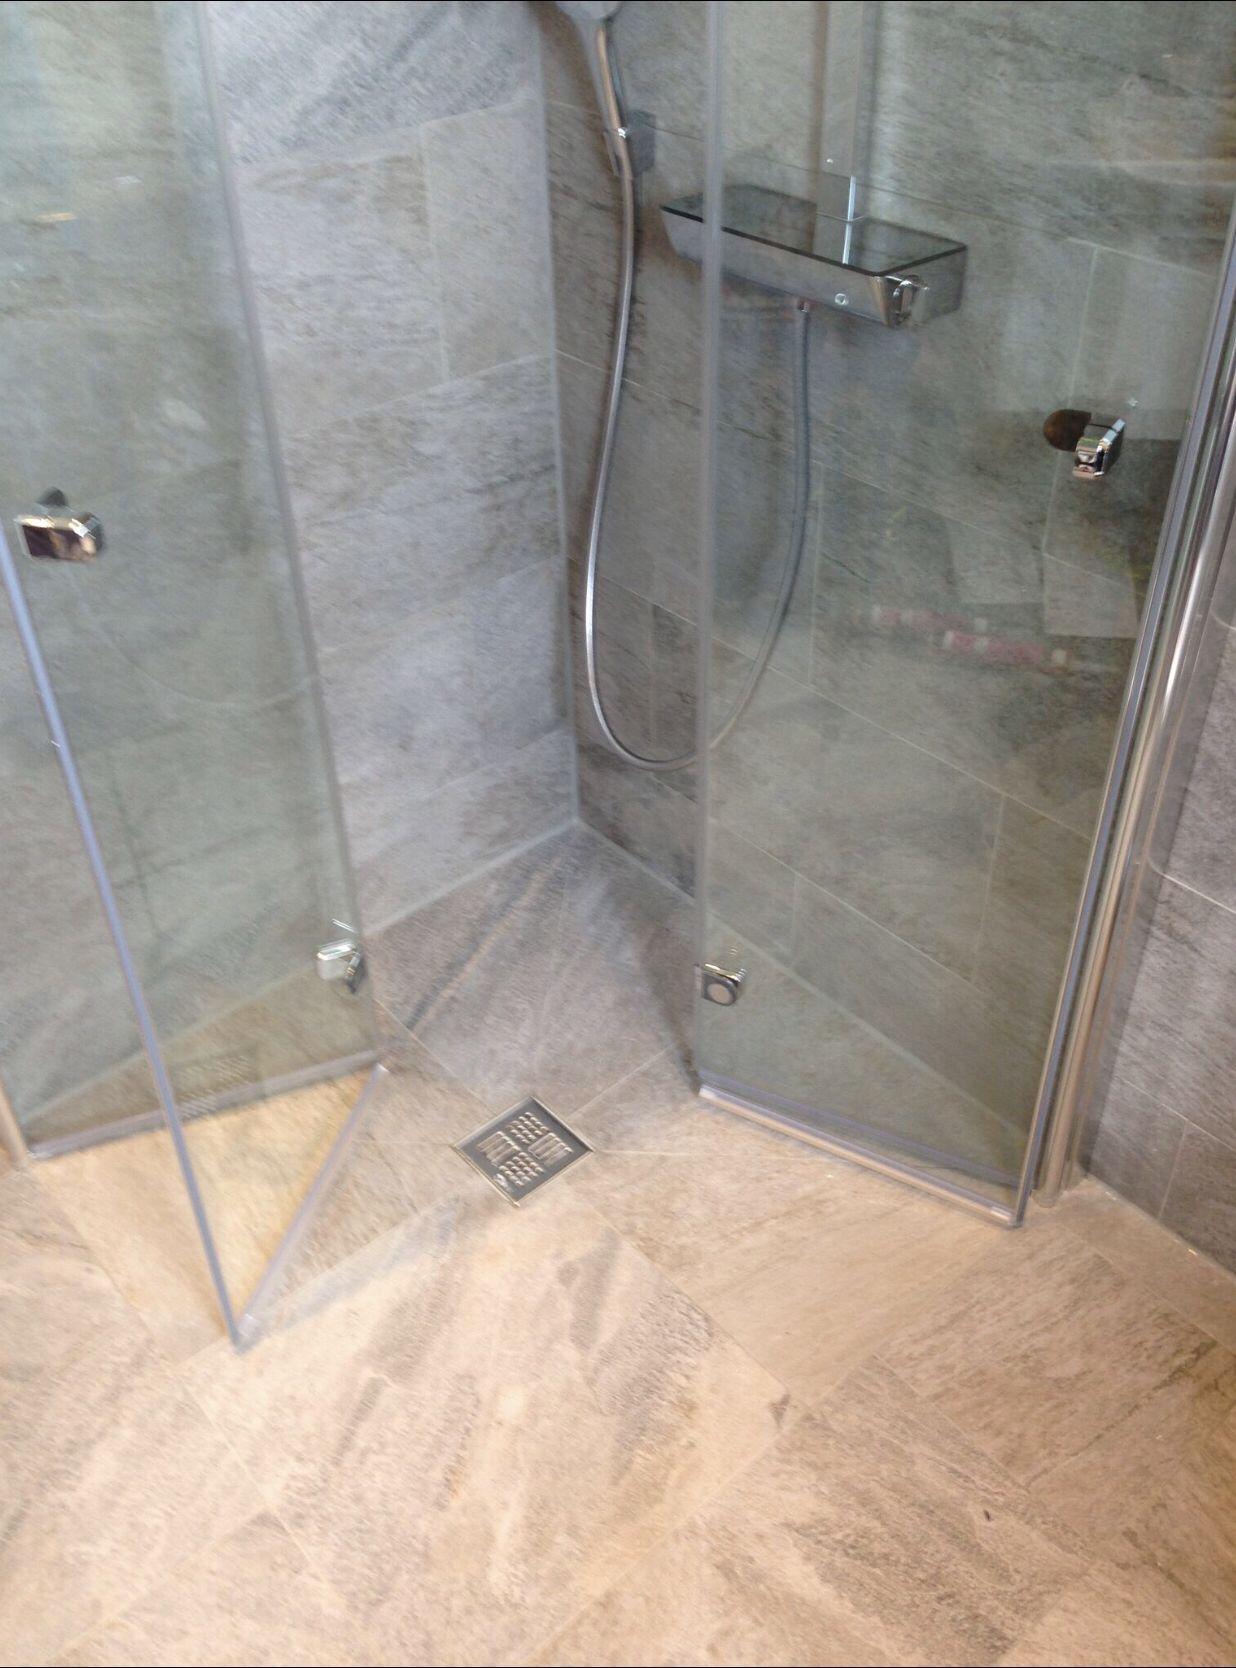 Bodengleiche Dusche Mit Duschwand Duschwand Dusche Badezimmer